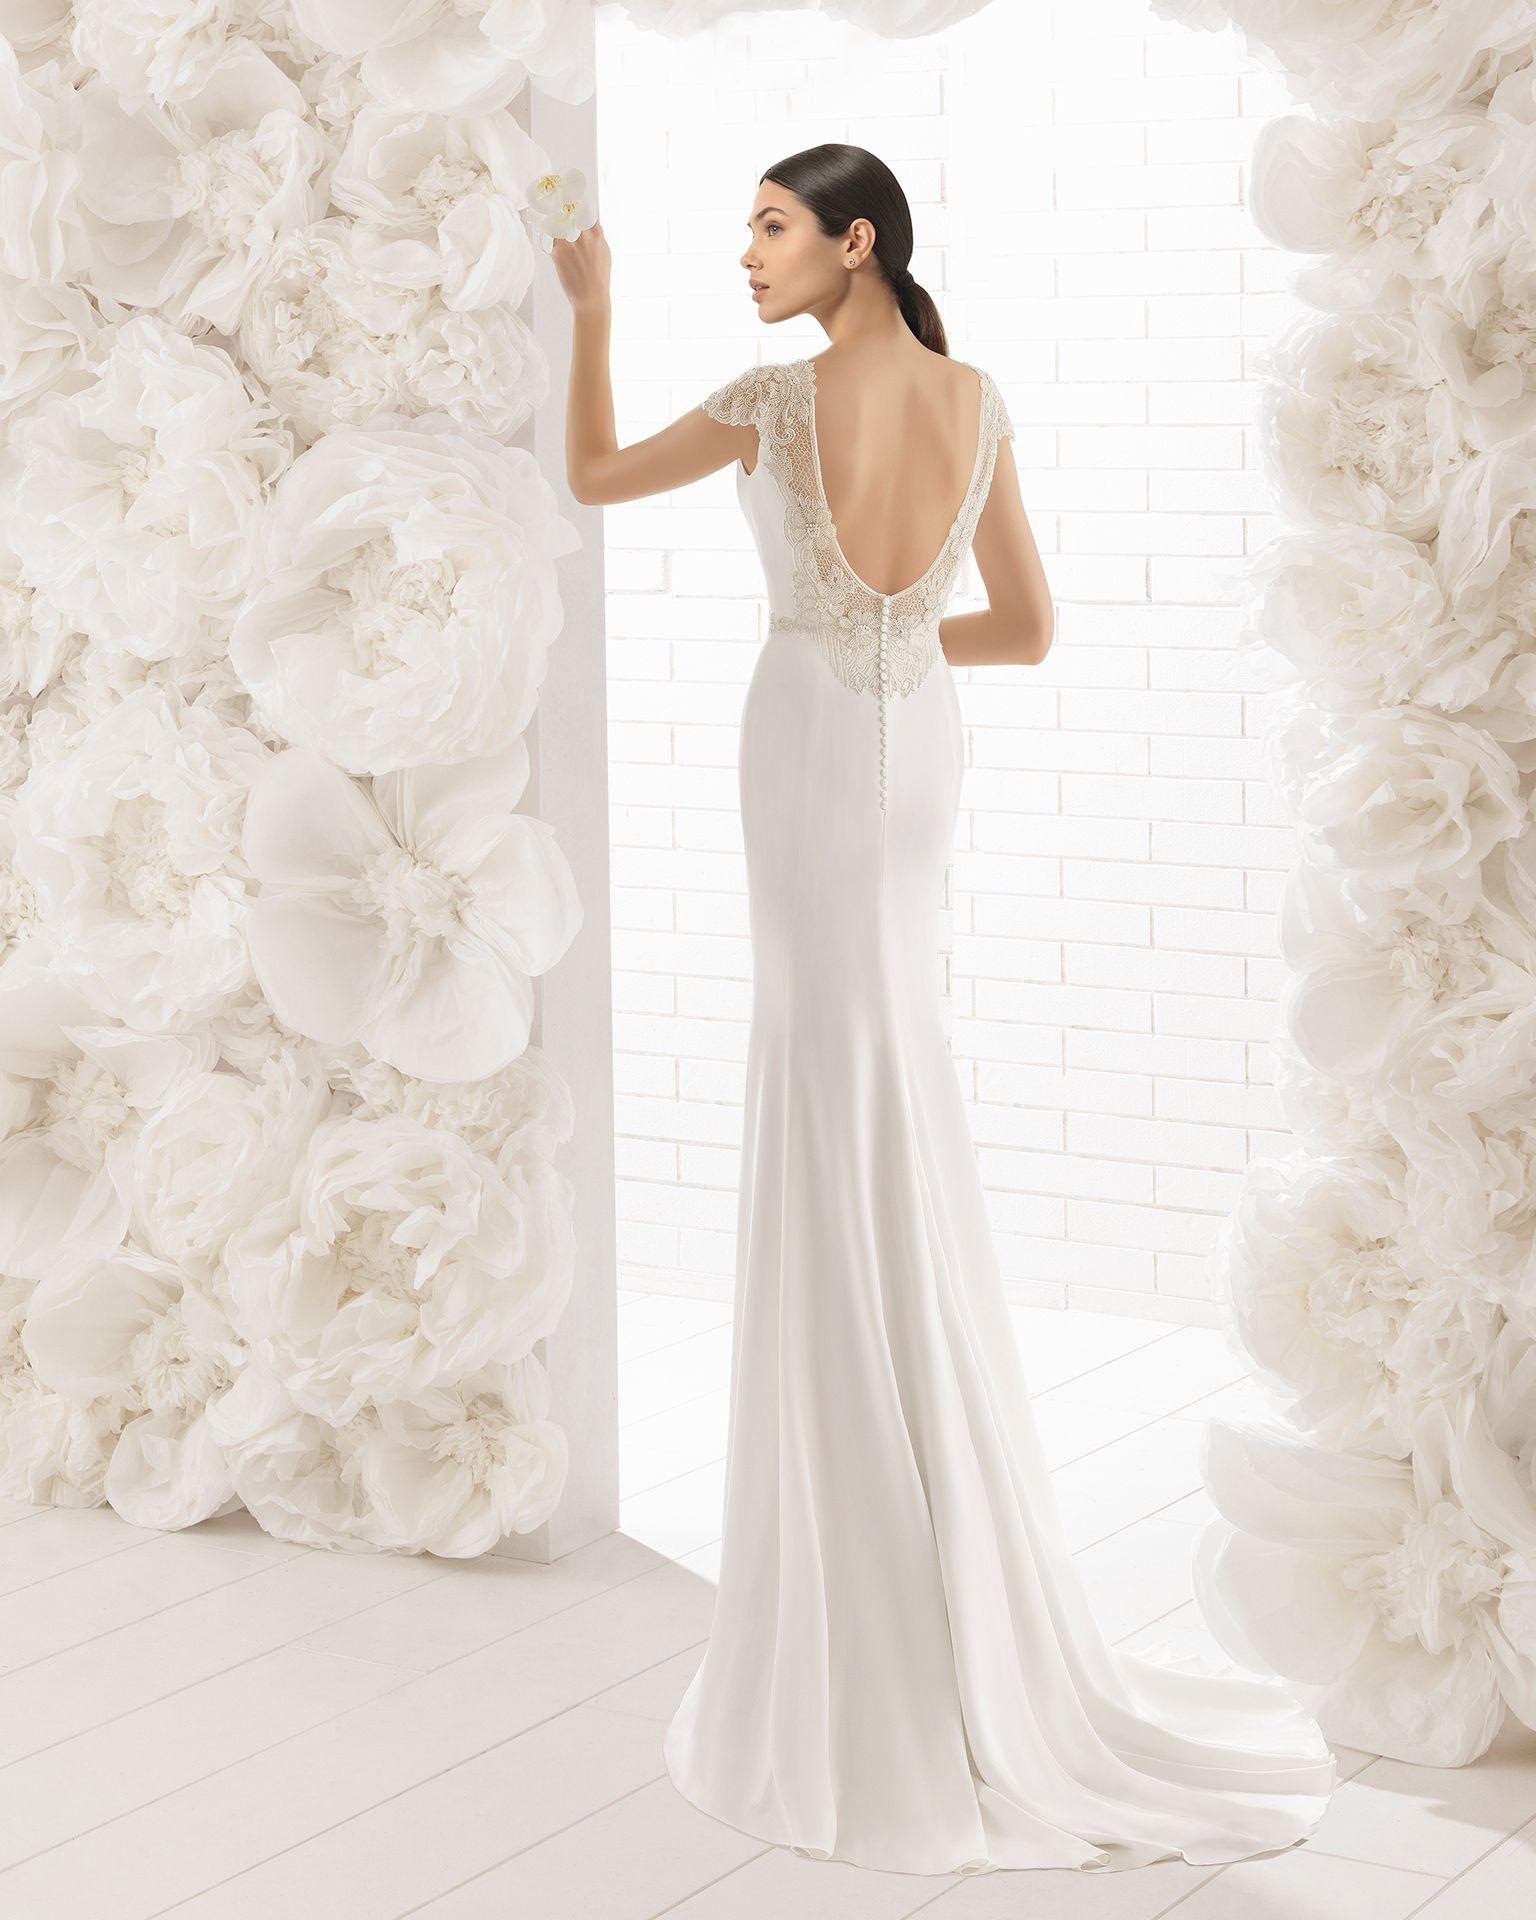 Wedding dress with bow on back  dmbntqenhoudfront